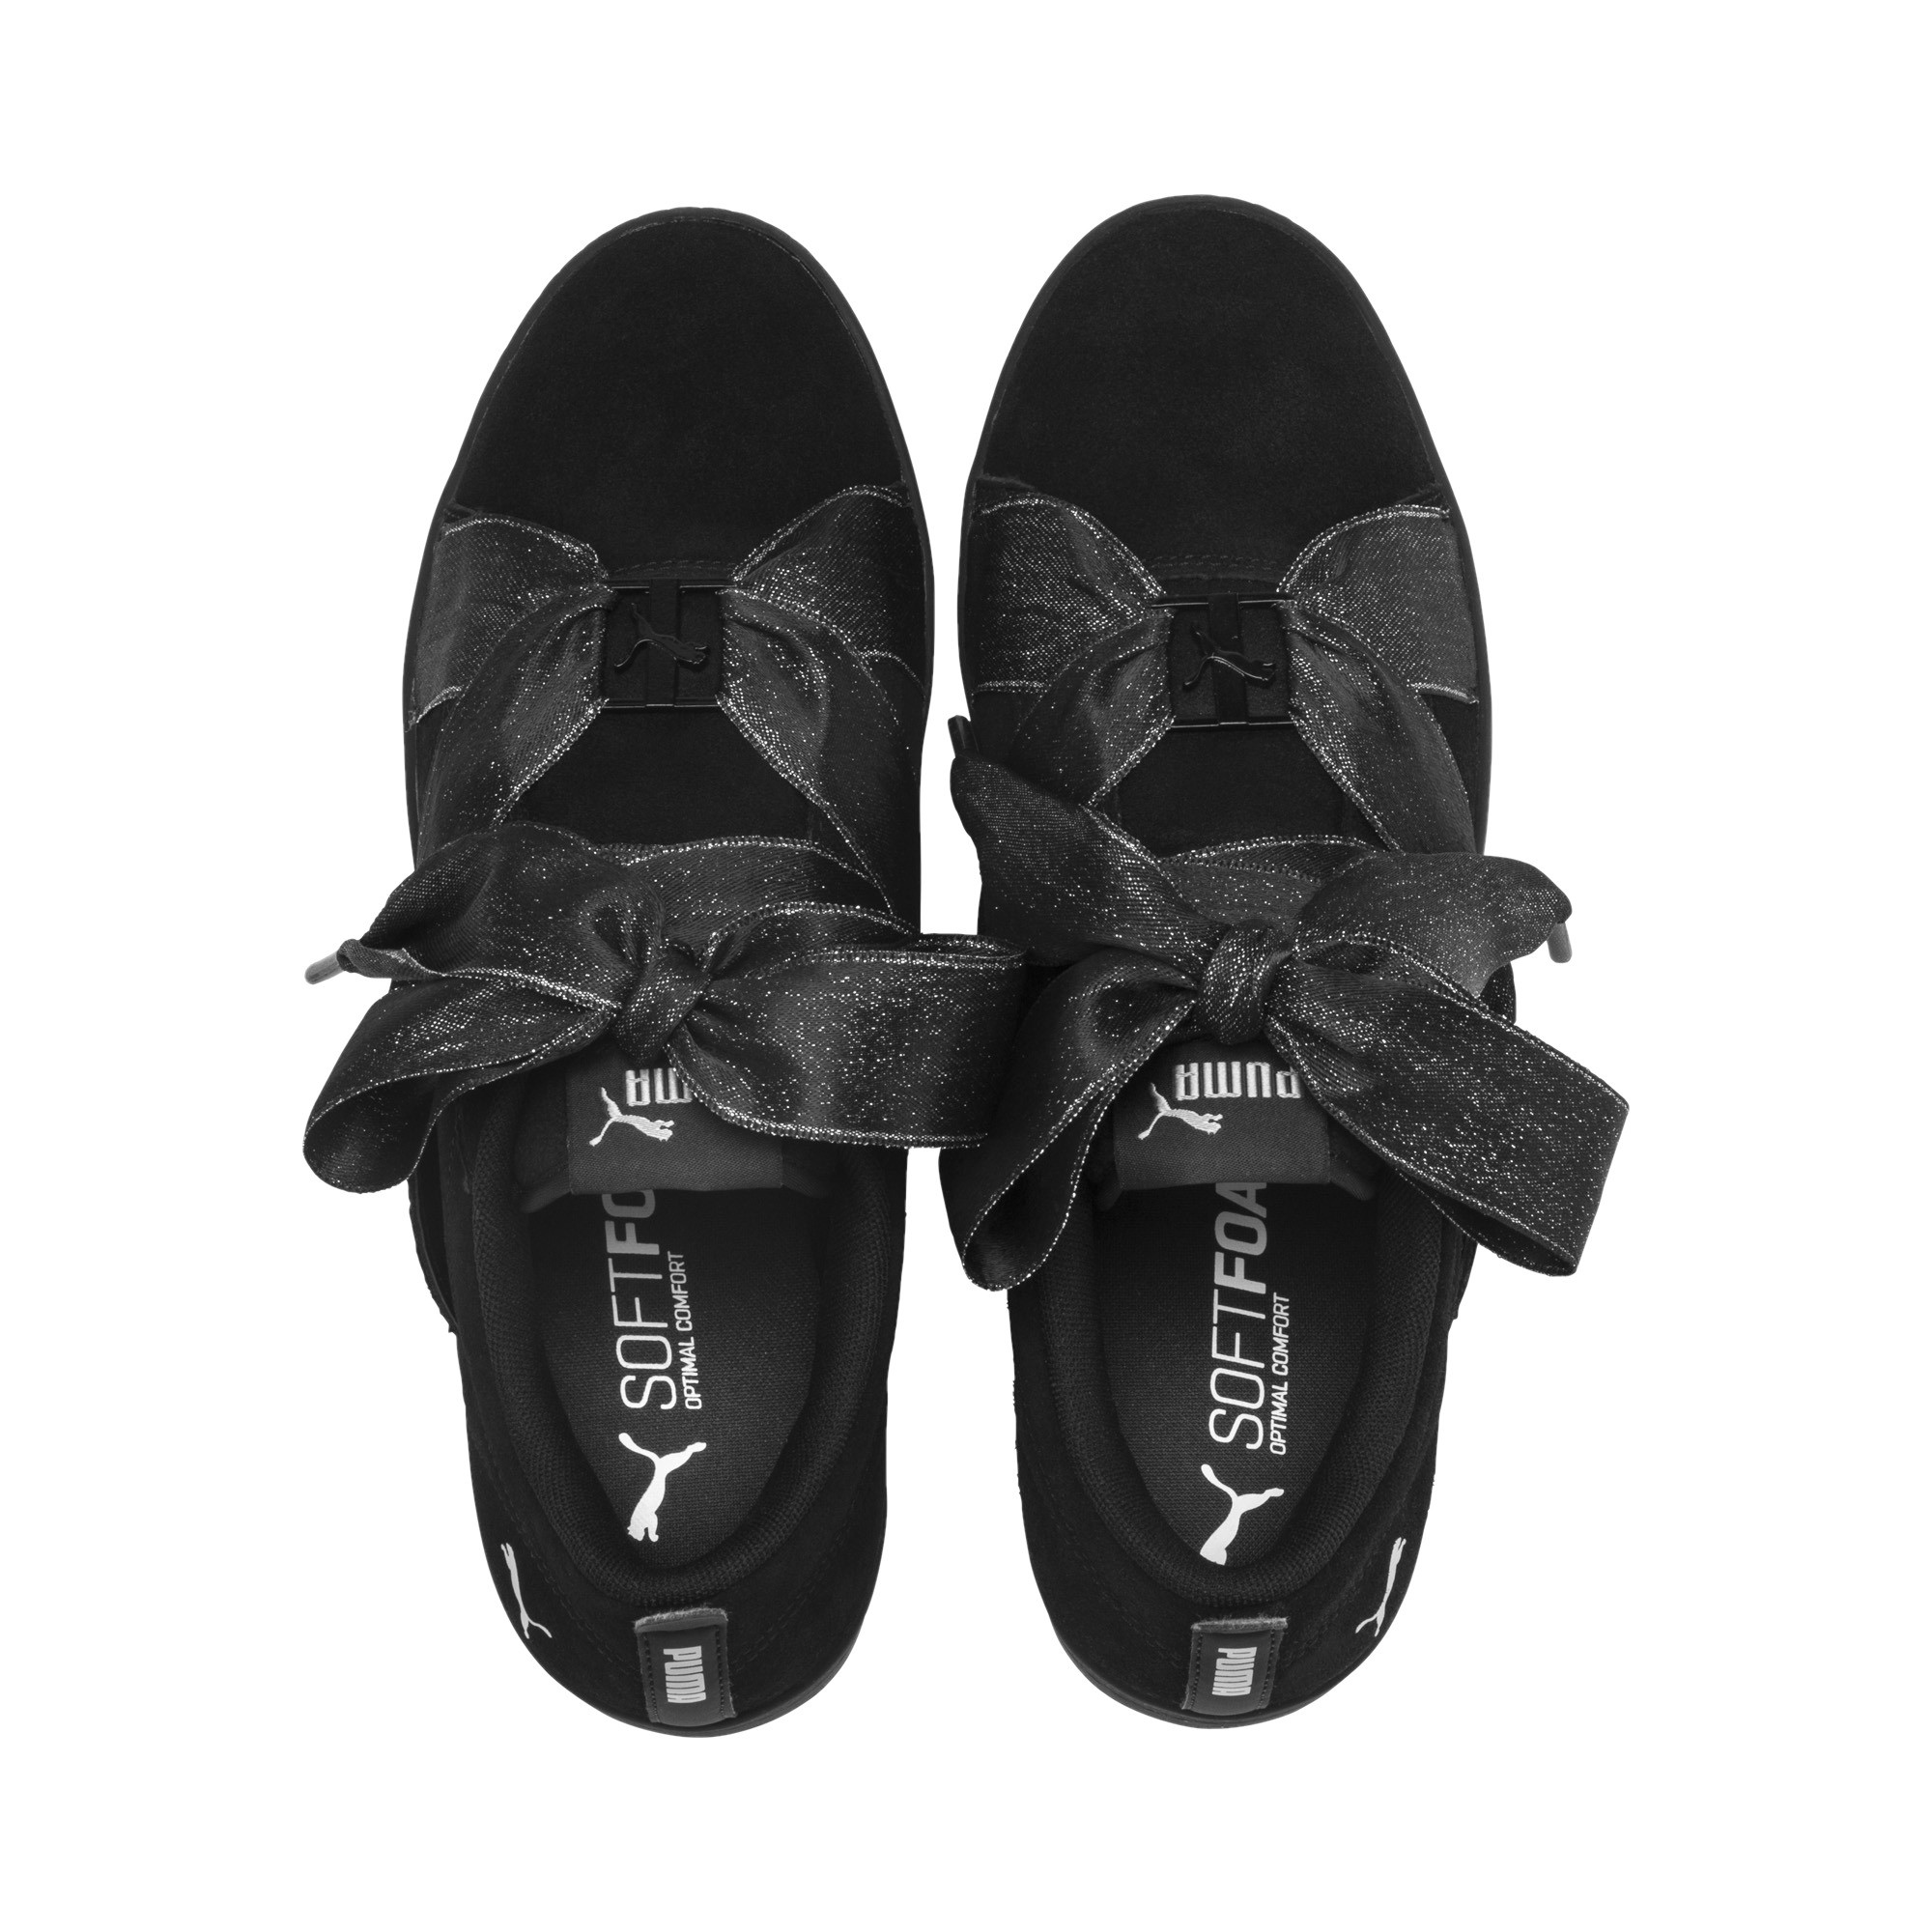 PUMA-PUMA-Smash-Astral-Buckle-Women-s-Sneakers-Women-Shoe-Basics thumbnail 15